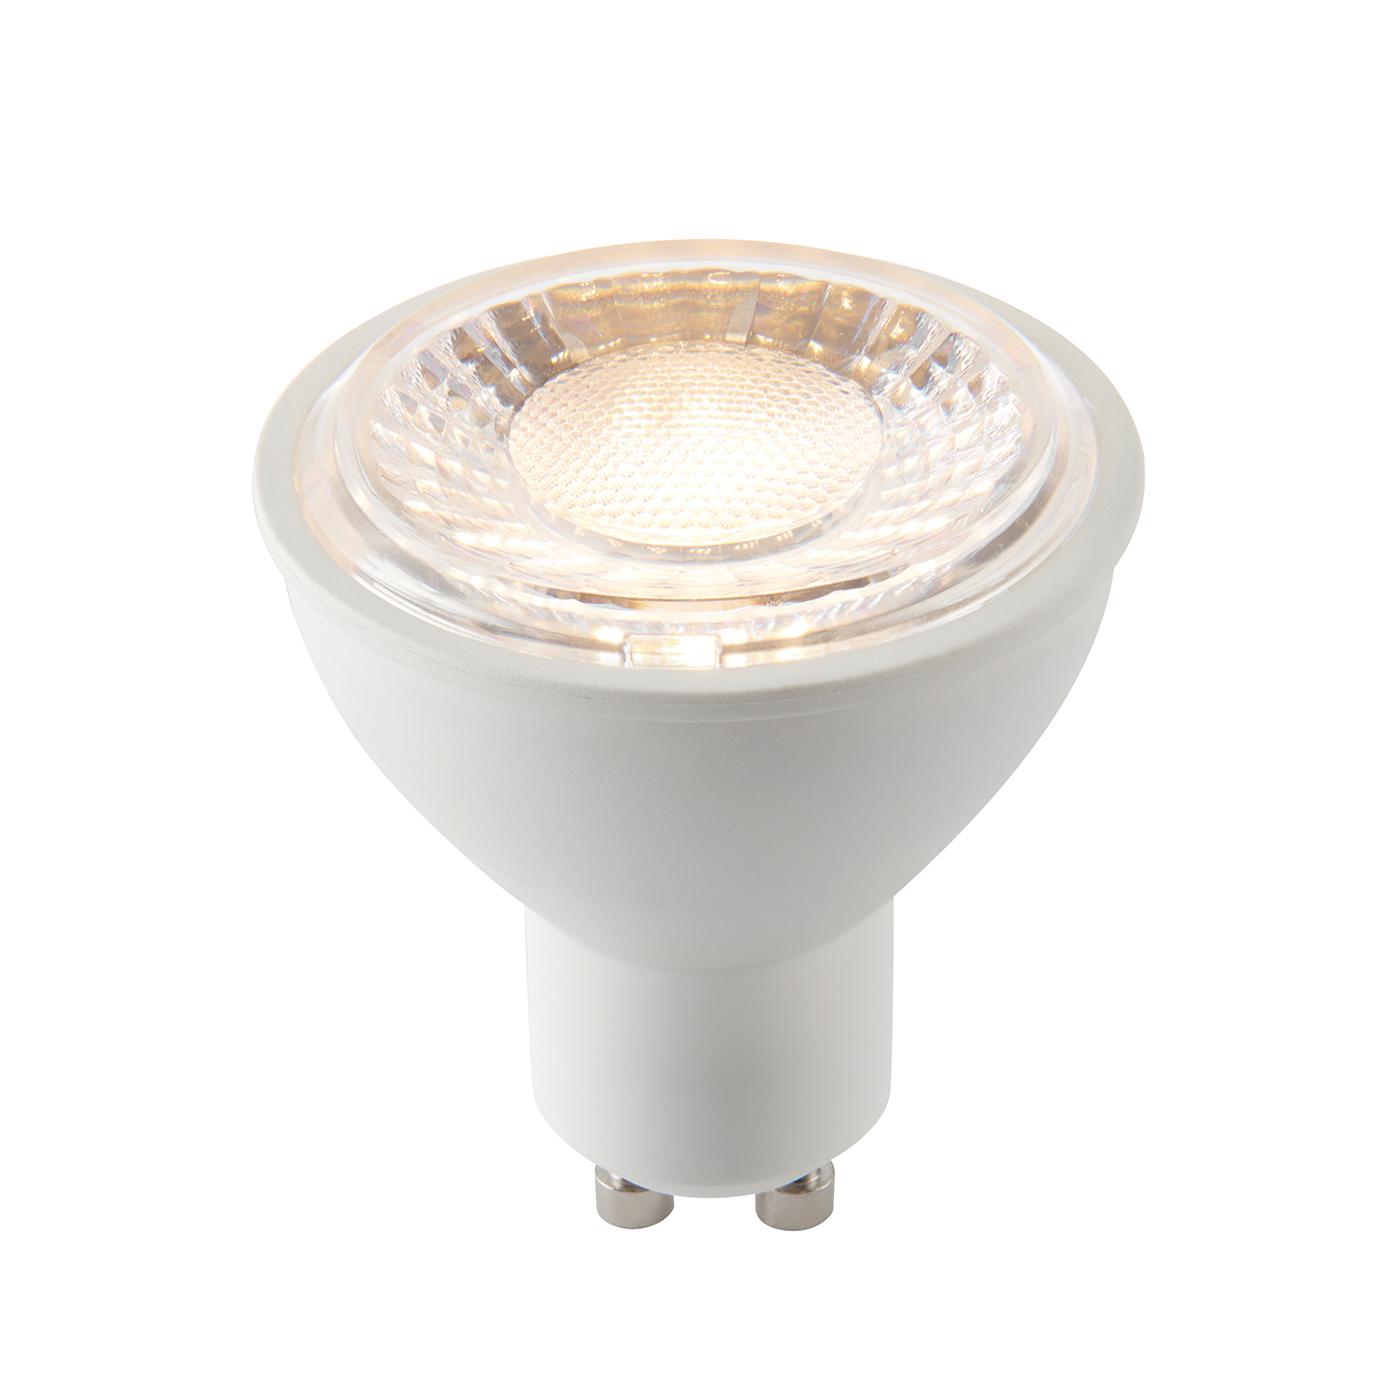 Endon 70053 LED SMD Lamp 3000K GU10 7W